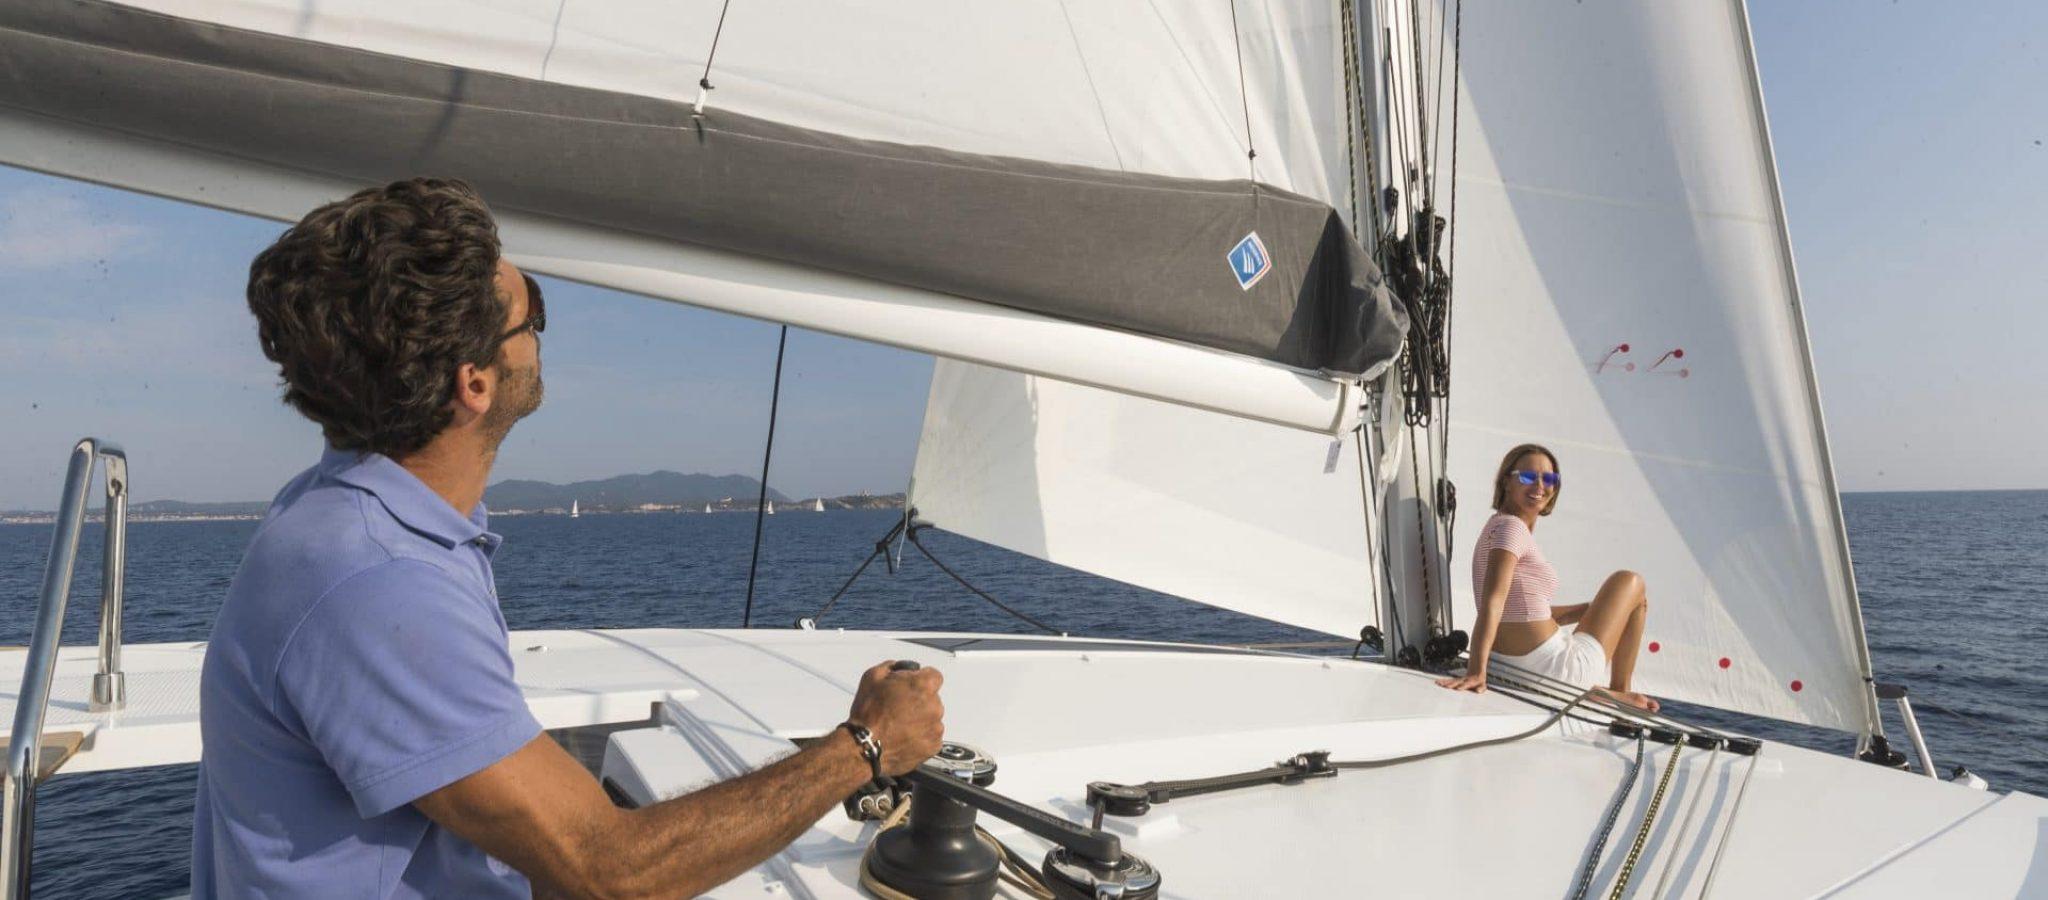 Location et vente Isla 40 catamaran à voile